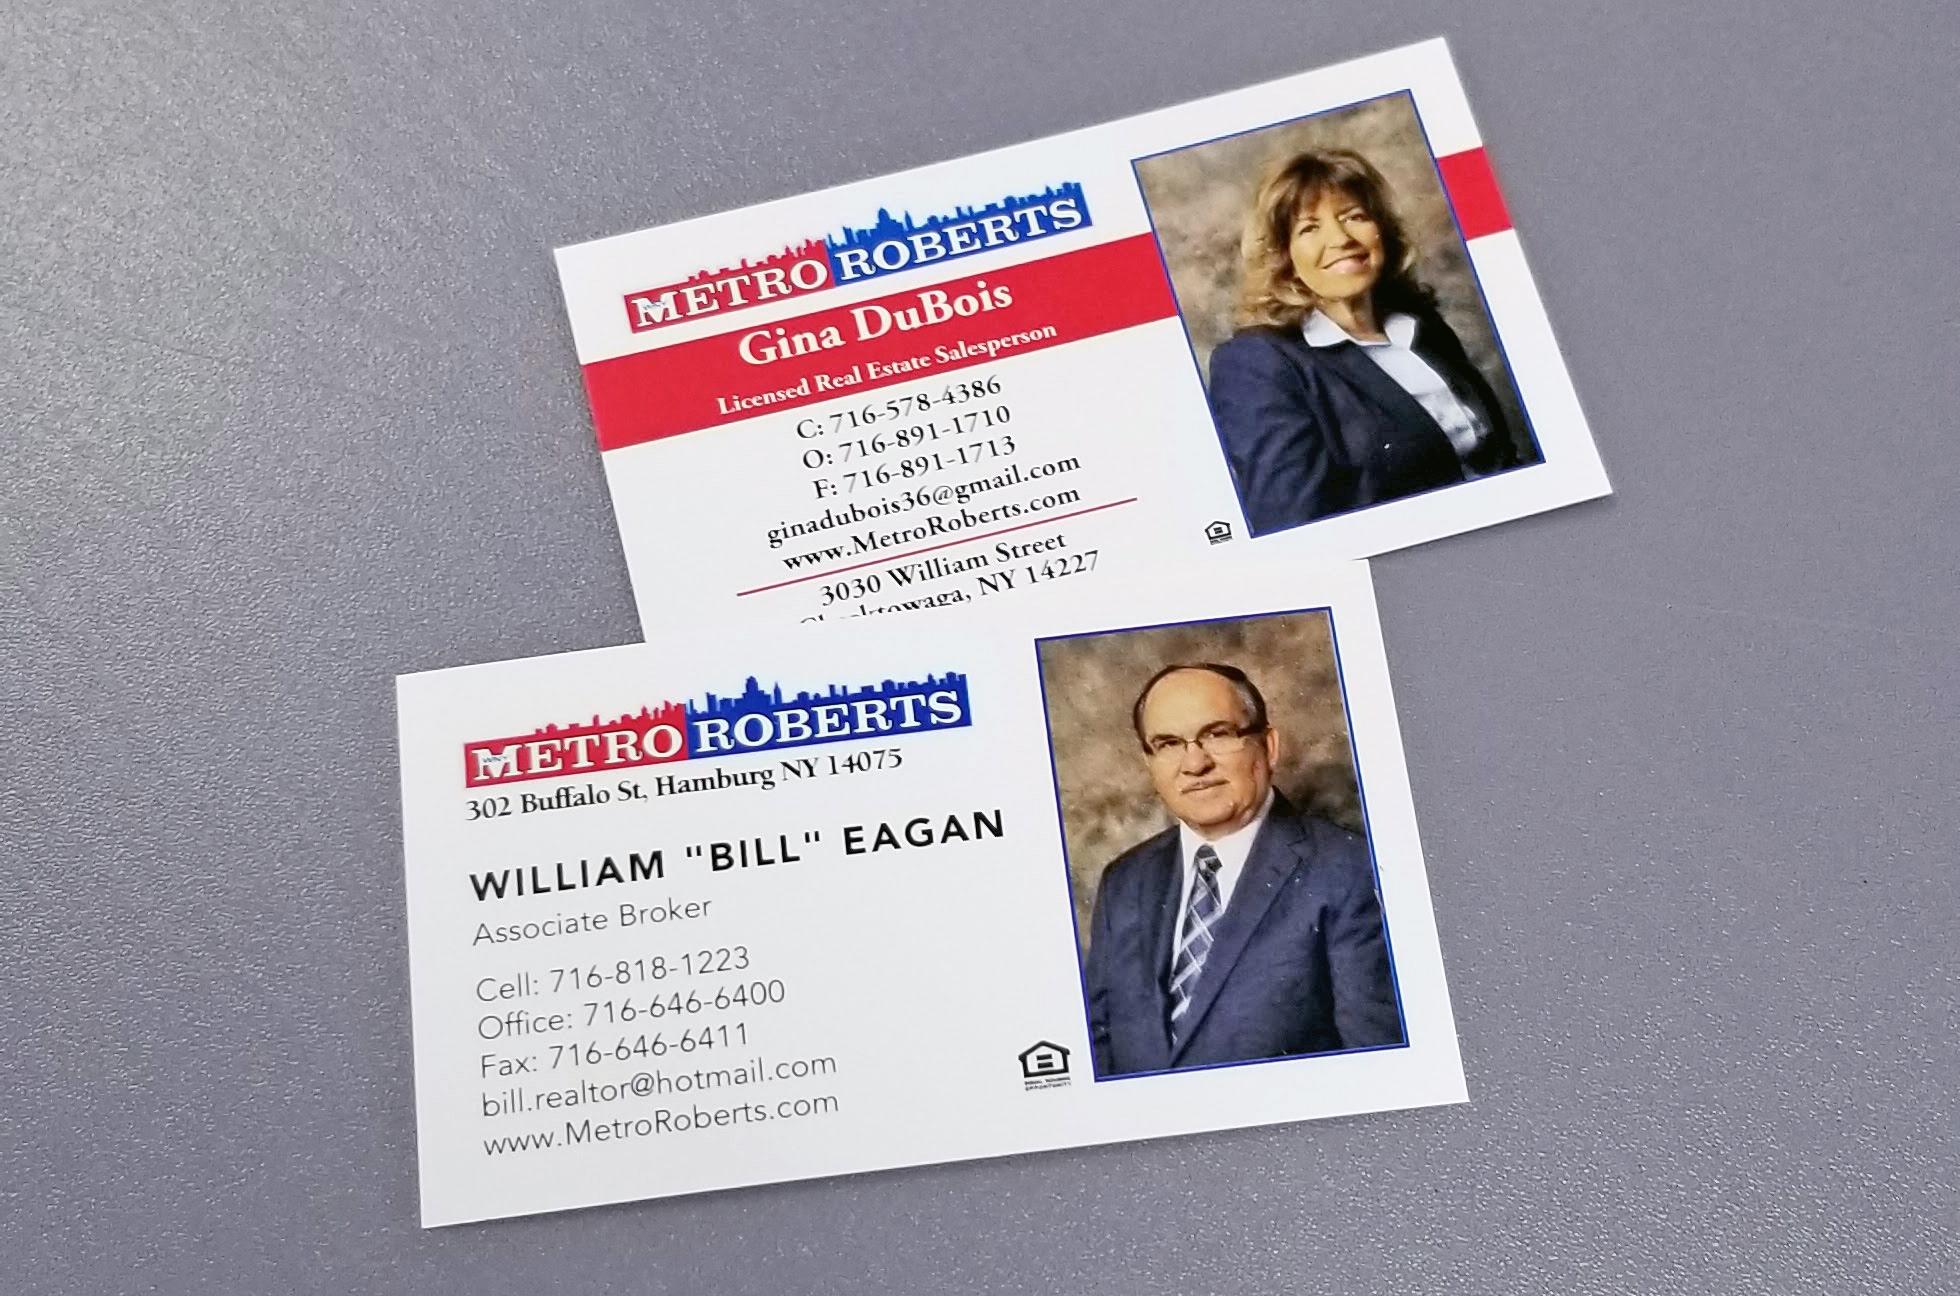 Metro Roberts Business Cards